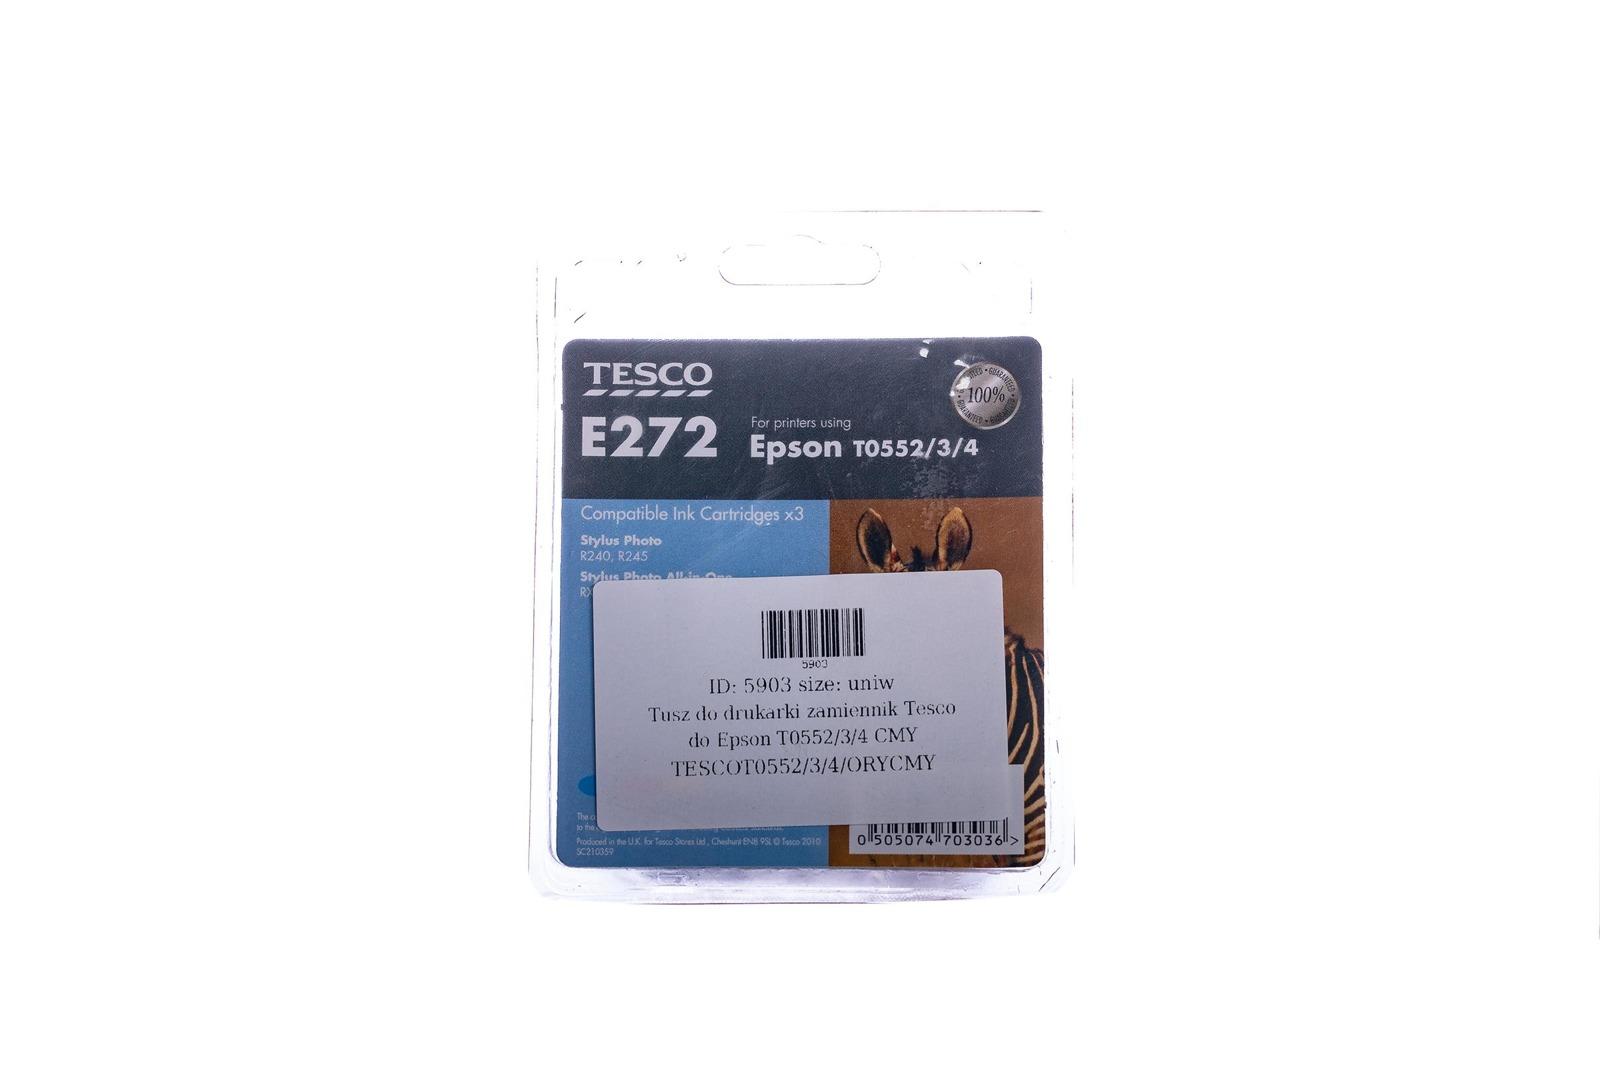 Remanufactured Ink cartridge Tesco Epson T0552/3/4 CMY